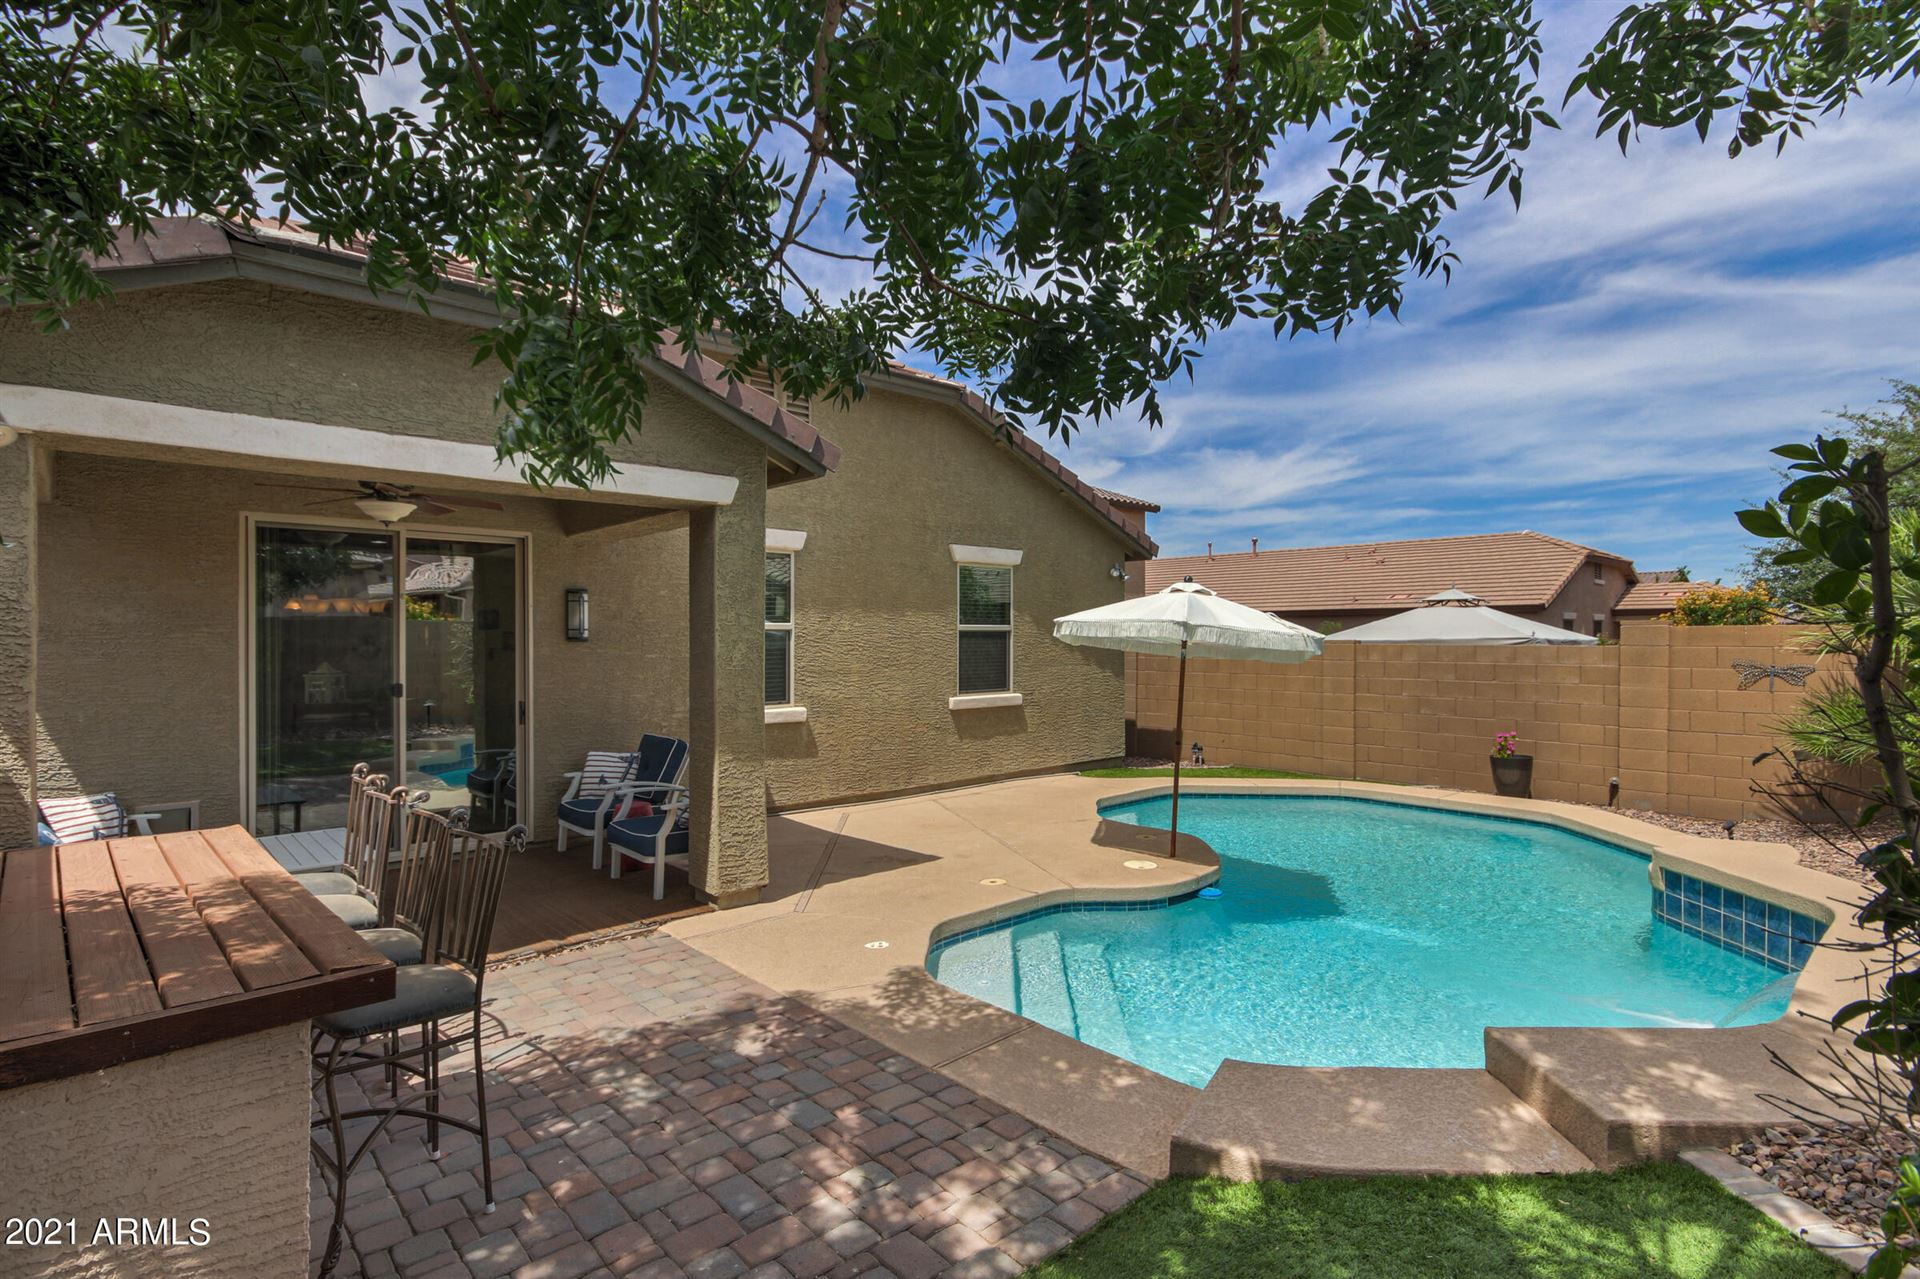 Photo of 4581 W Kirkland Avenue, San Tan Valley, AZ 85142 (MLS # 6249207)